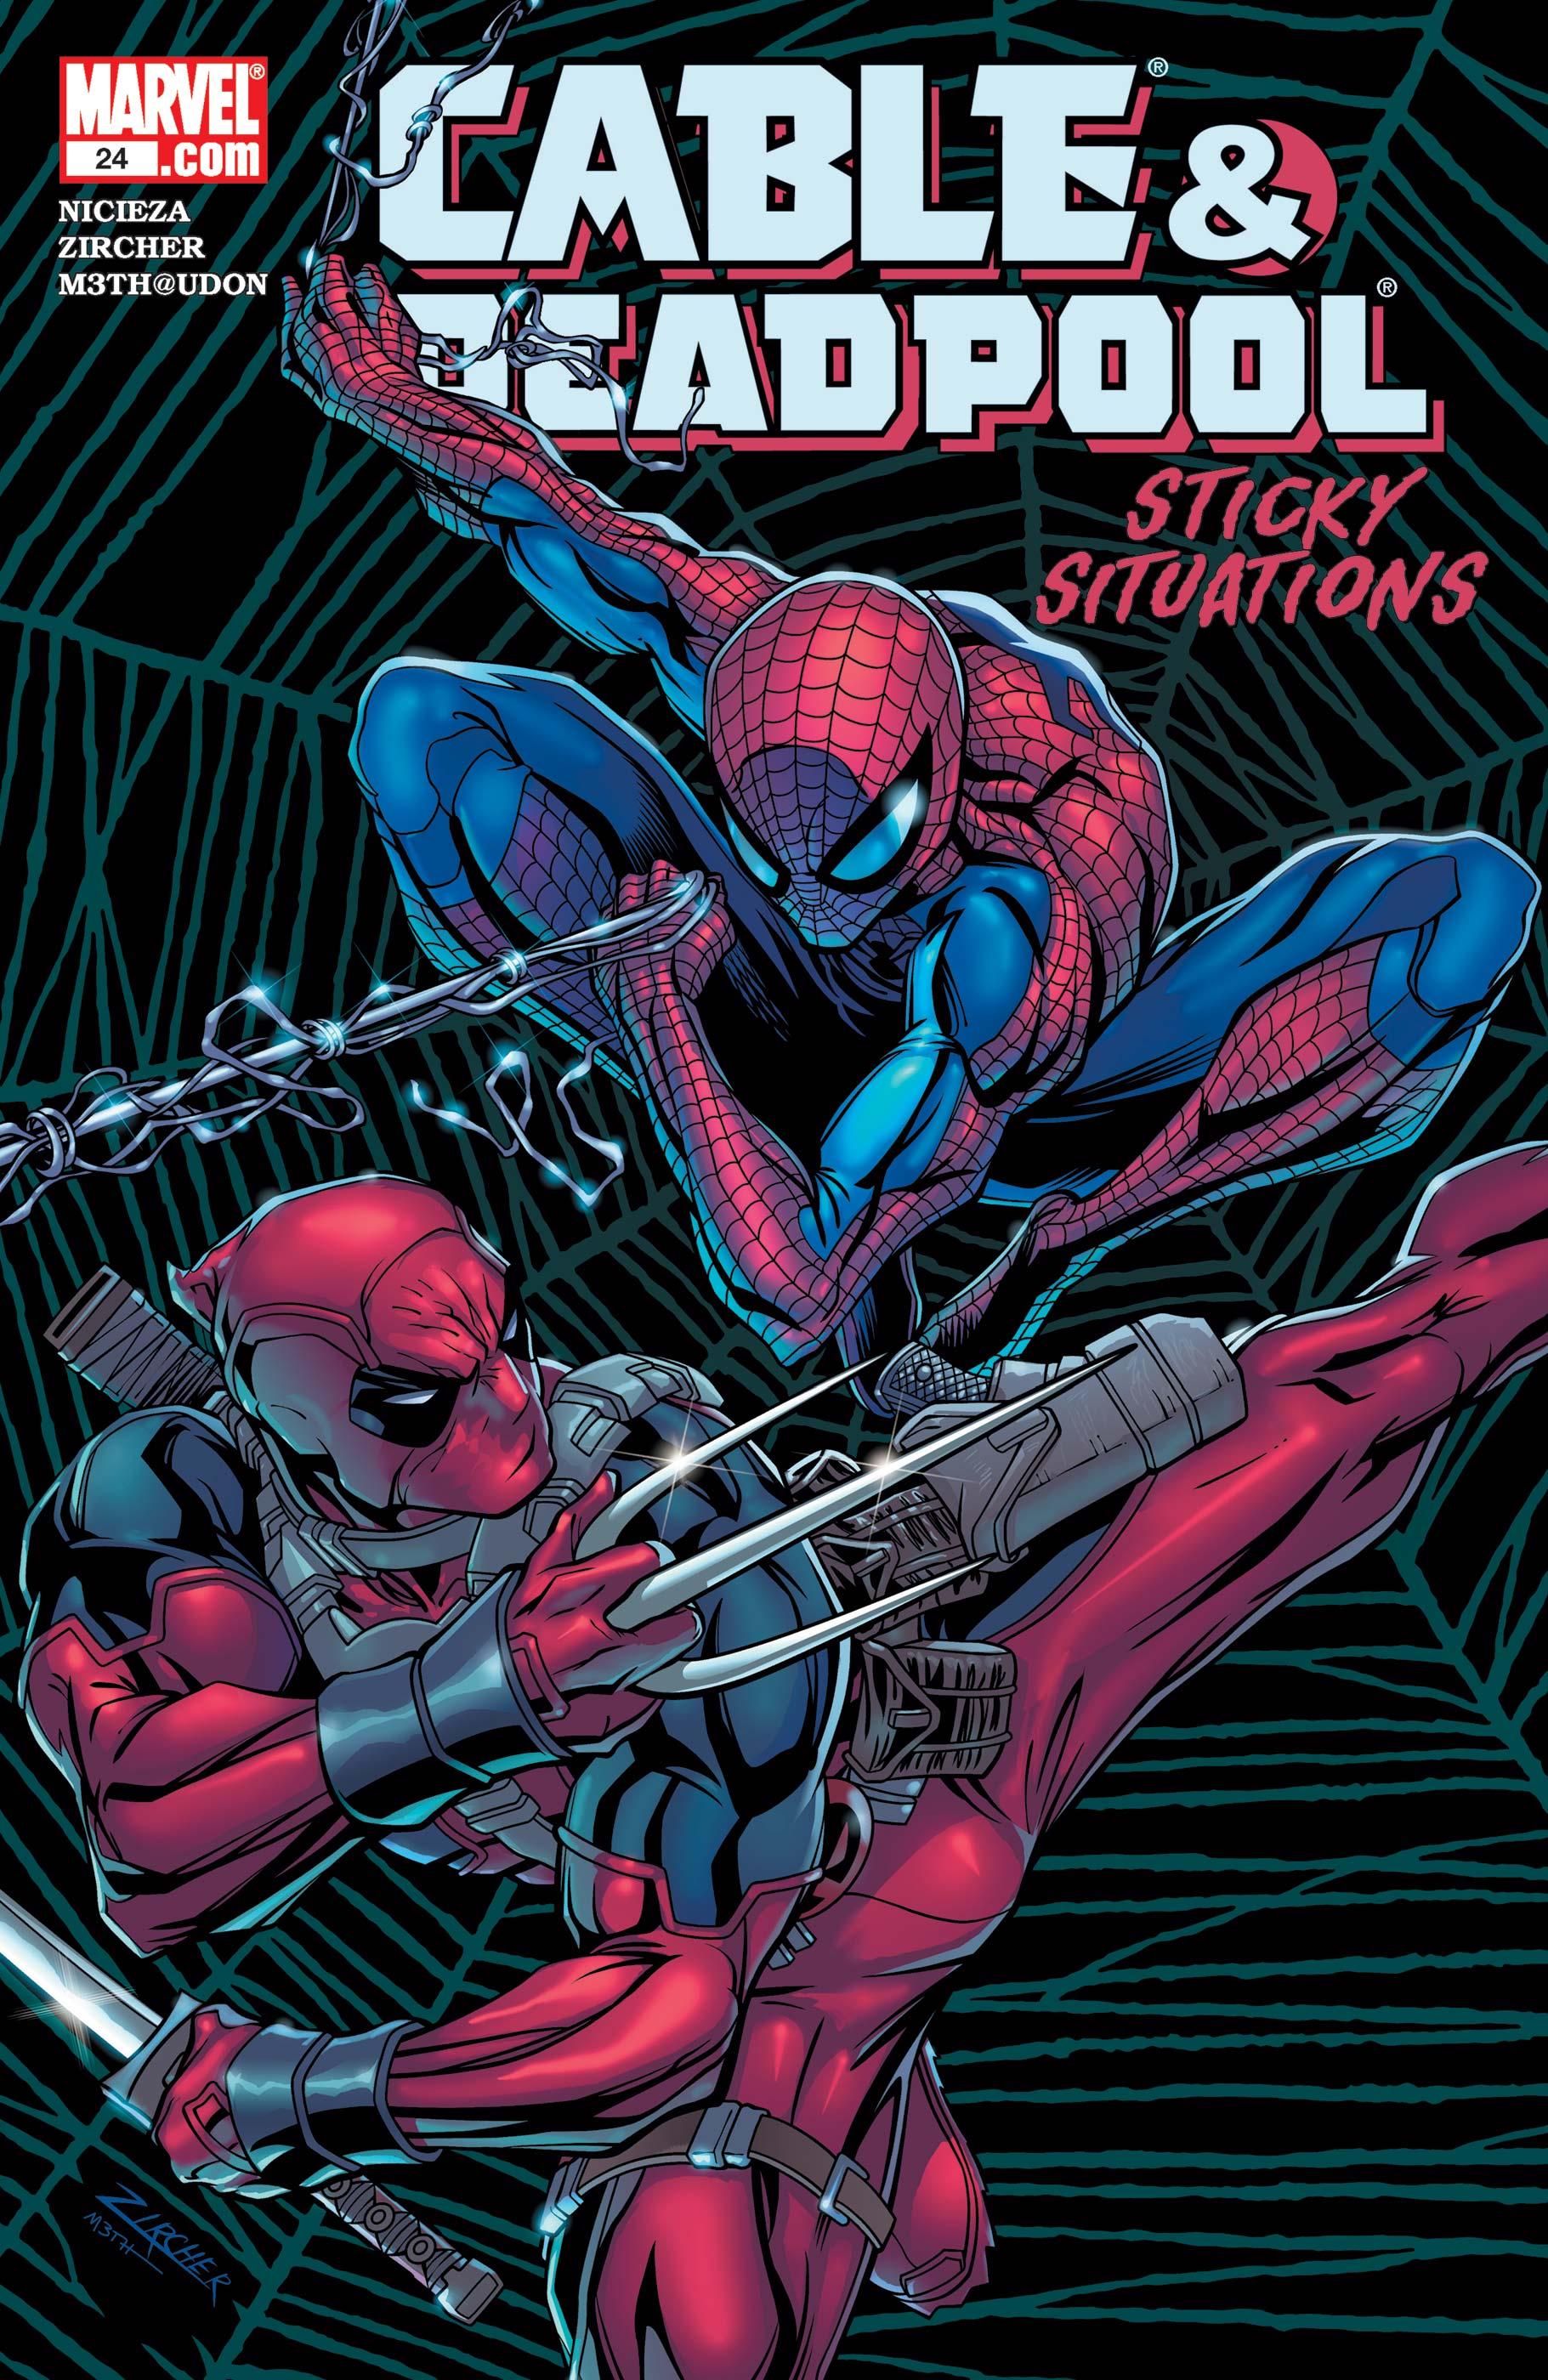 Cable & Deadpool (2004) #24